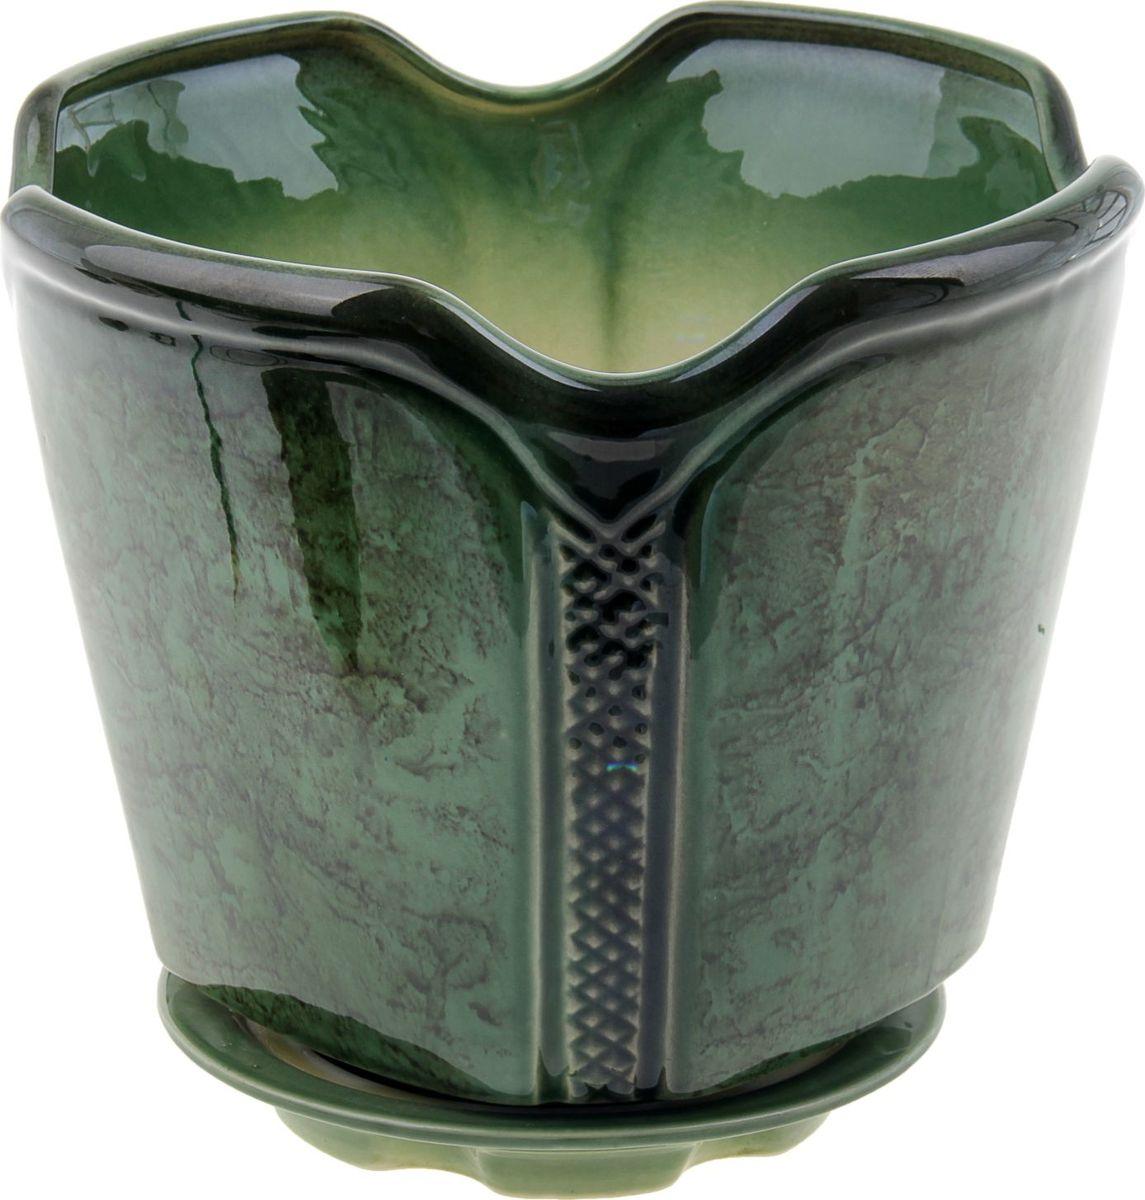 Кашпо Готика, цвет: зеленый, 7,1 л838557